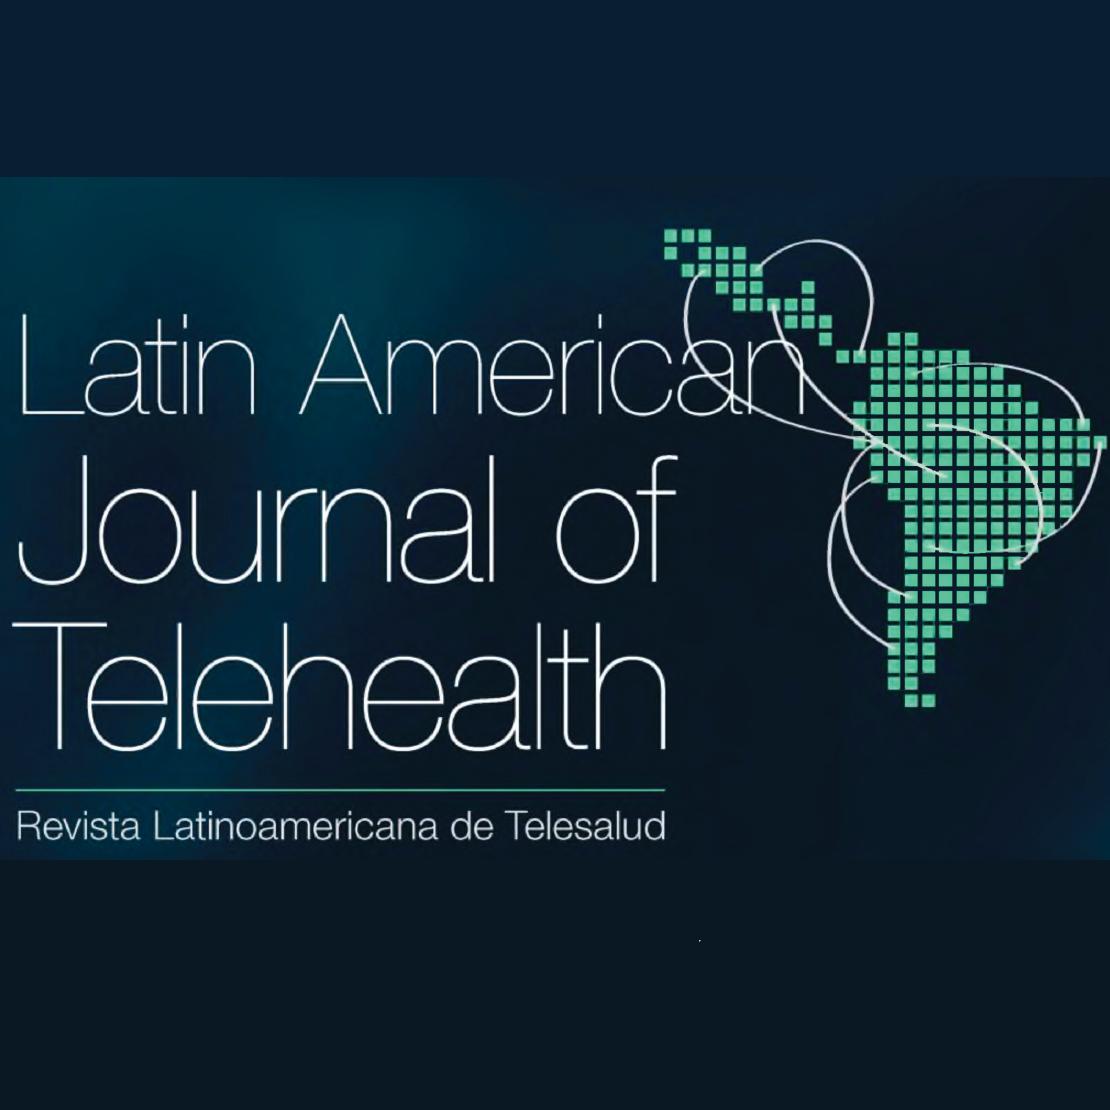 Revista Latinoamericana De Telessaúde